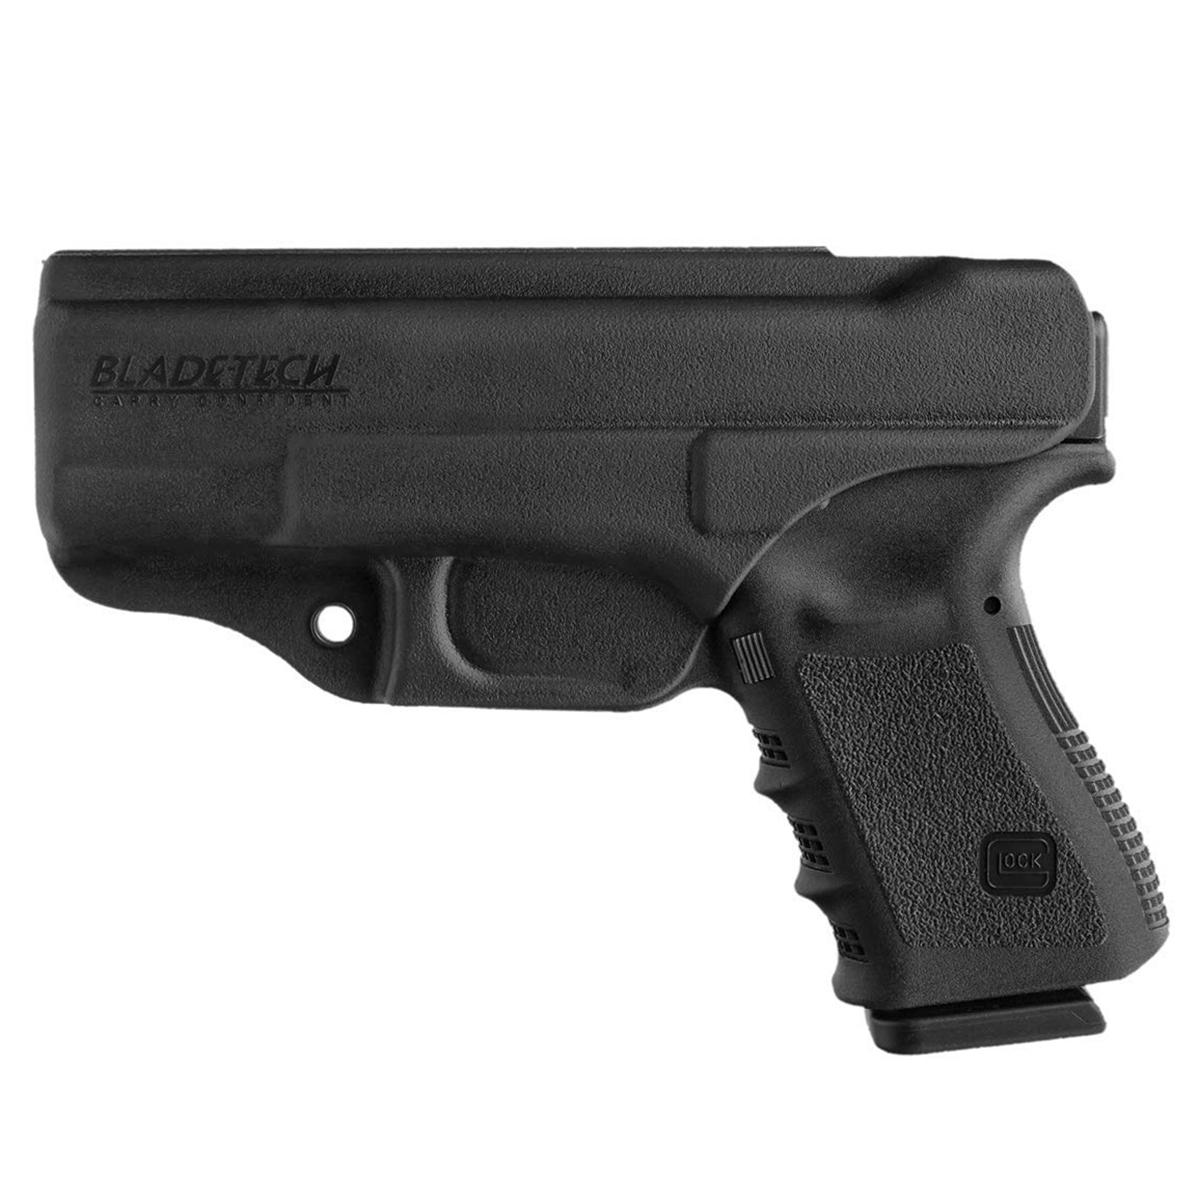 Blade-Tech Klipt Glock-19 Conceal Holster, Right